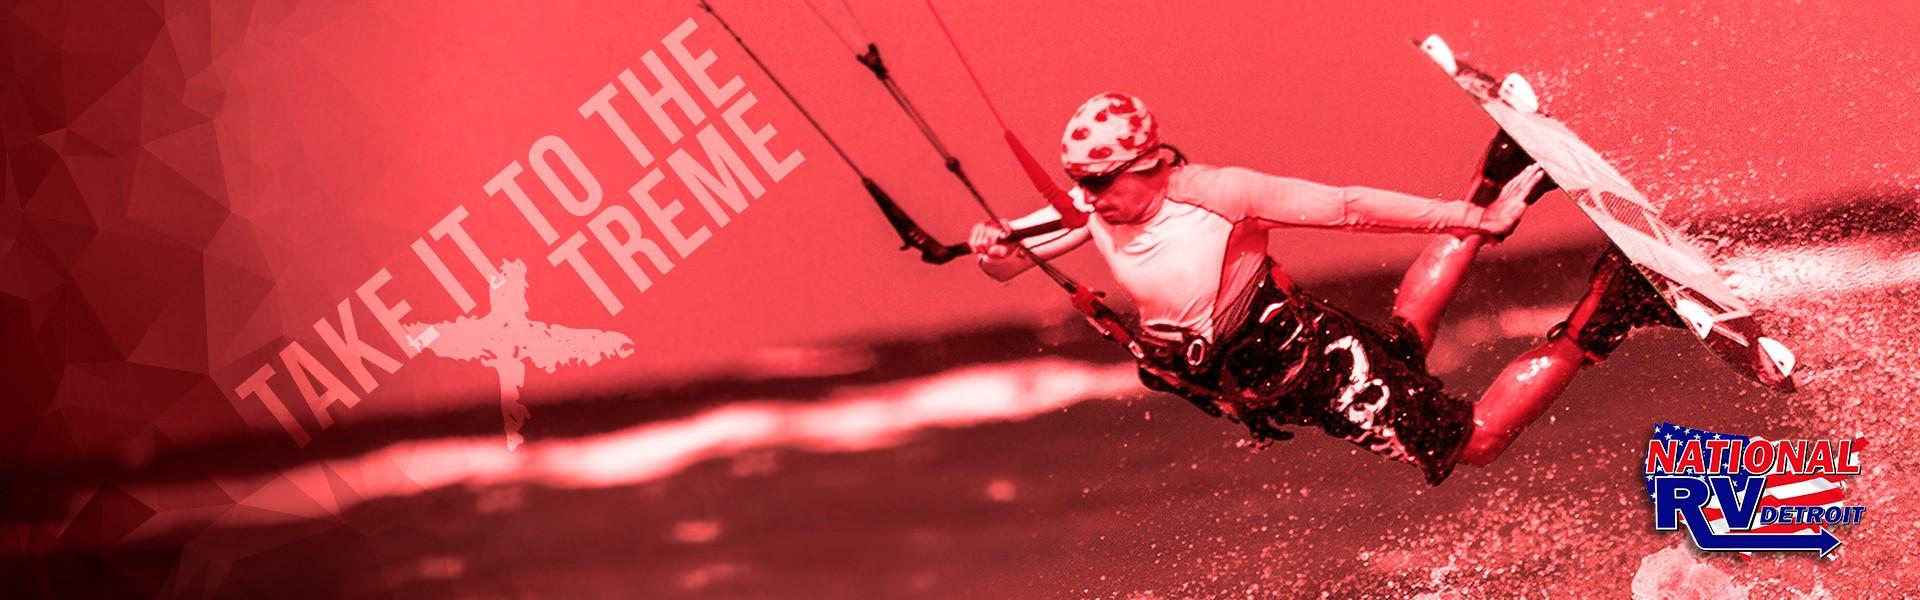 Take it to the xtreme - man kiteboarding